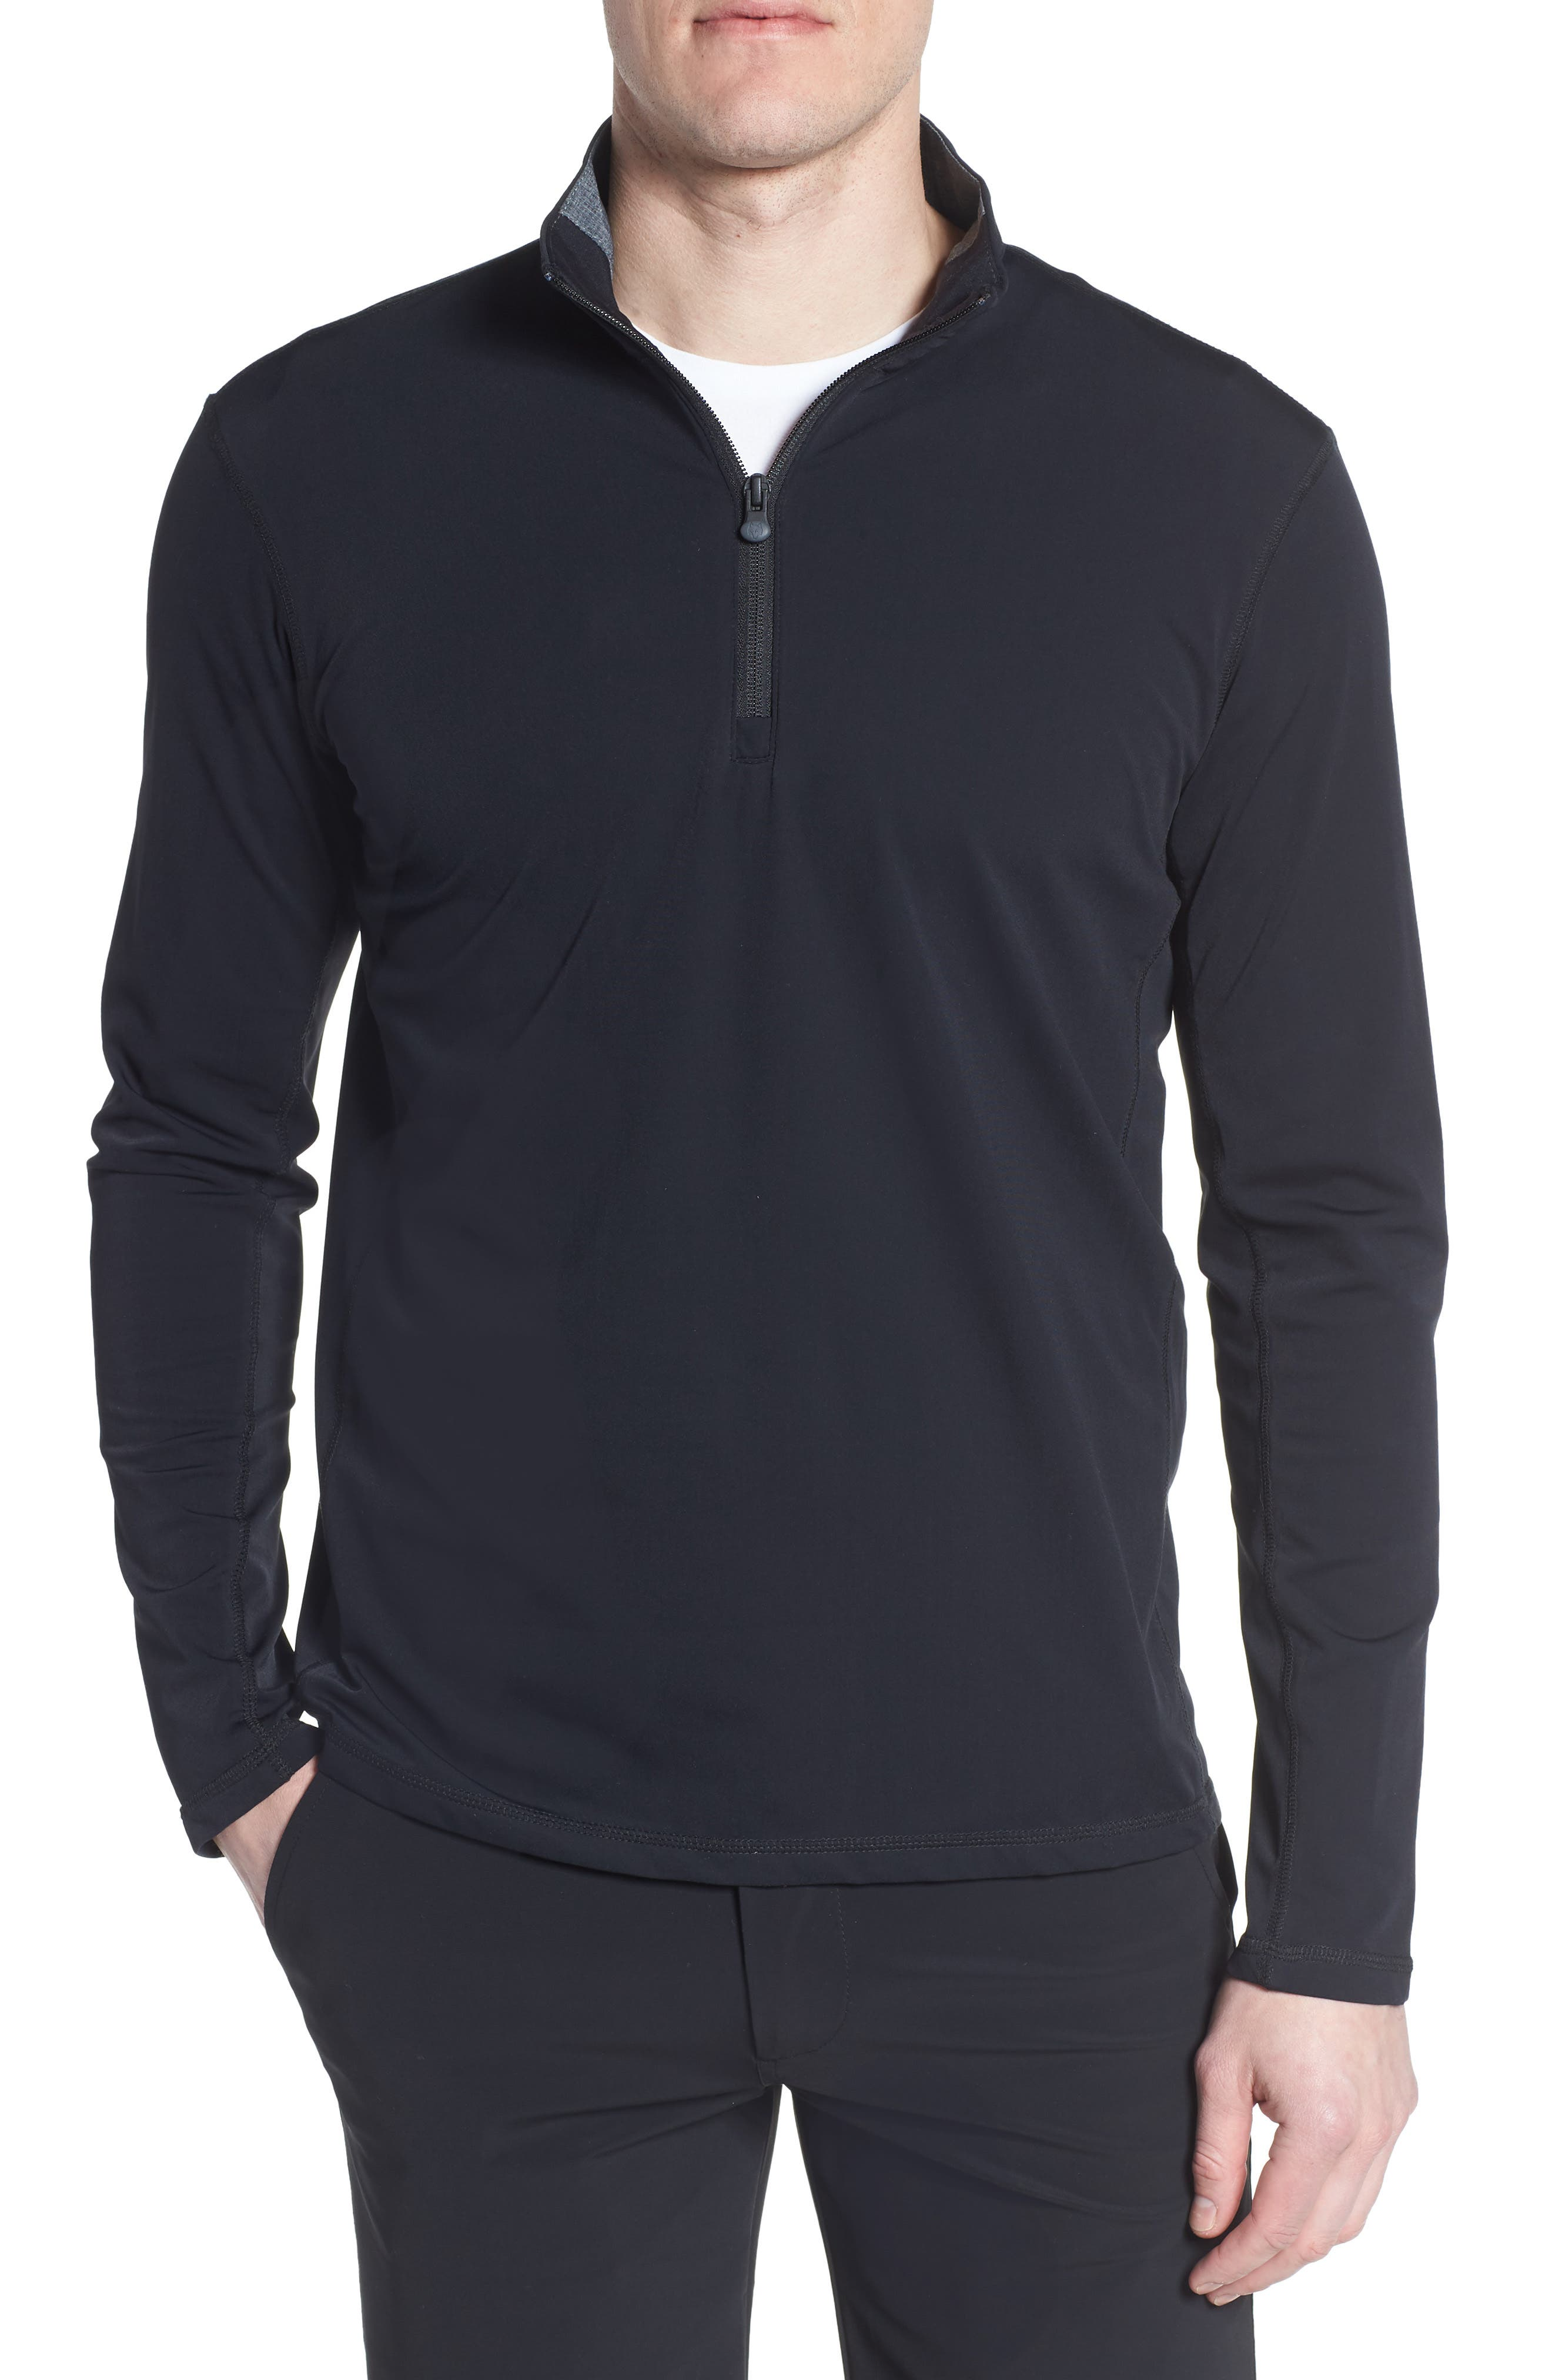 GREYSON Tate Quarter Zip Pullover